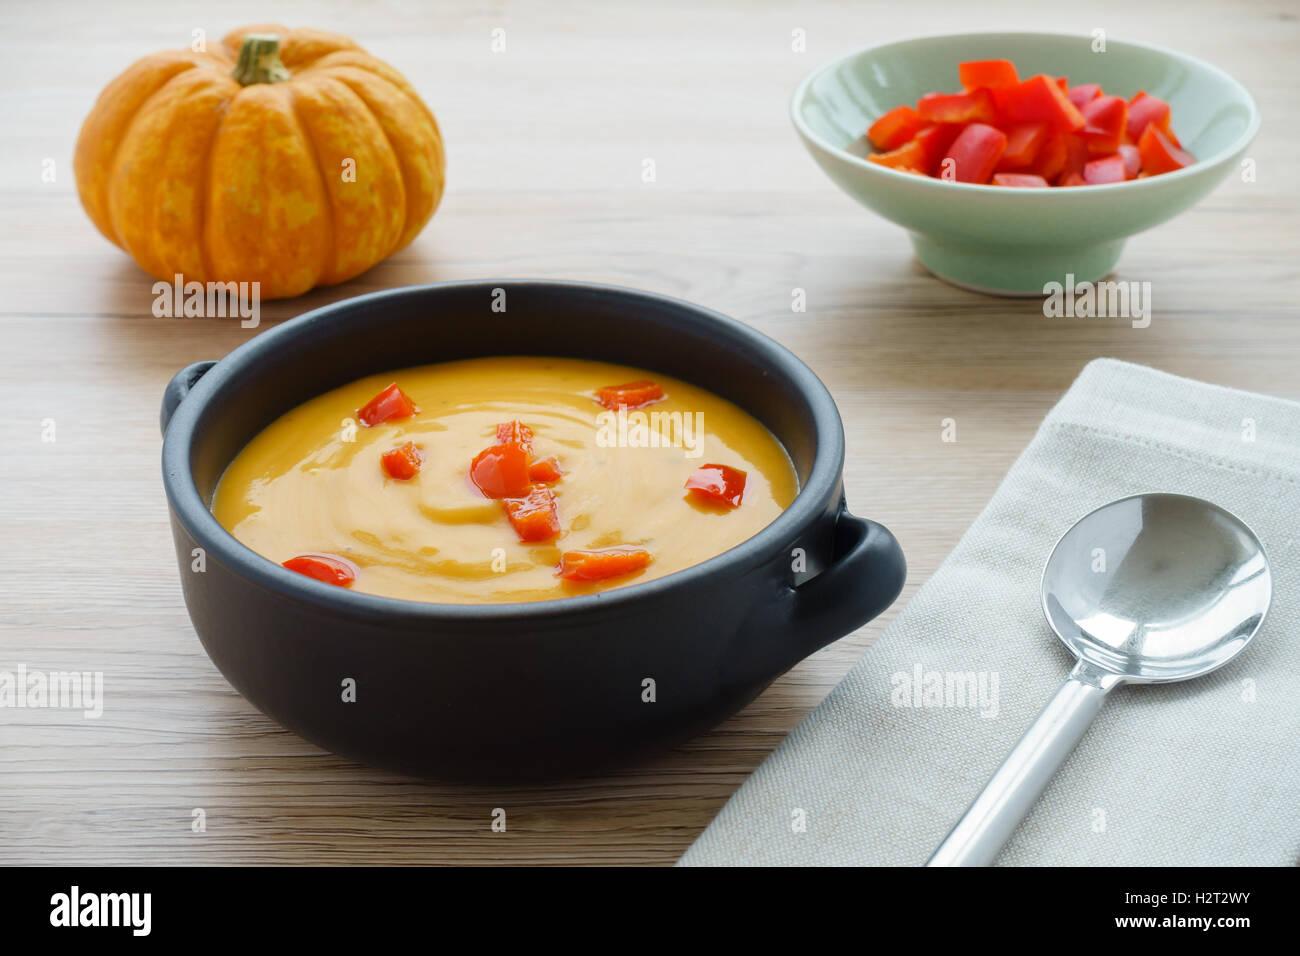 Pumpkin Soup, Sea Salt Flakes and Munchkin Pumpkin - Stock Image